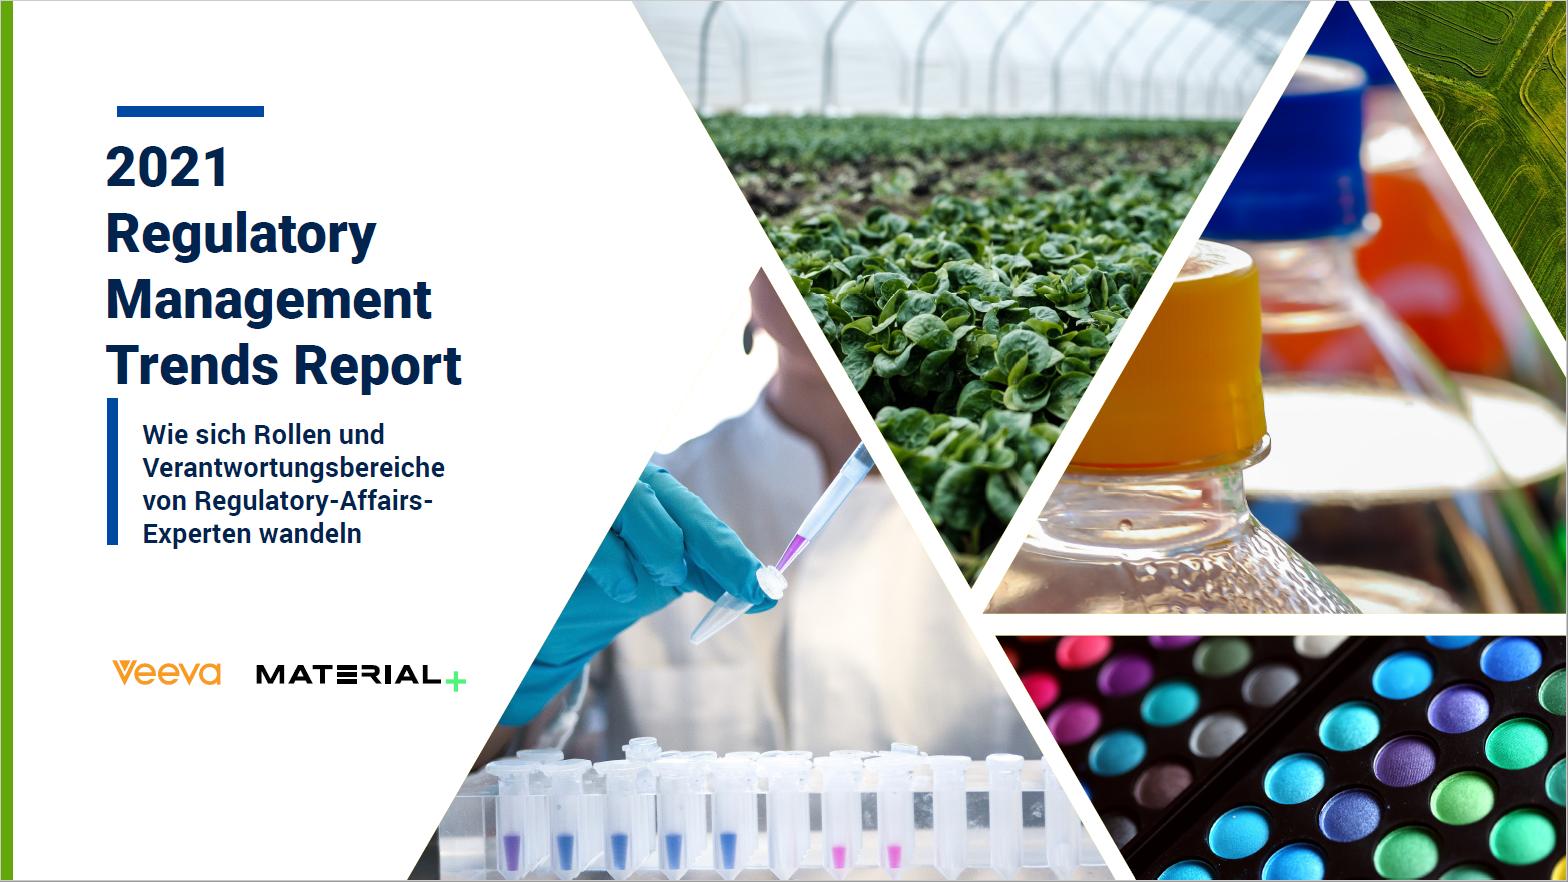 2021 Regulatory Management Trends Report - DE